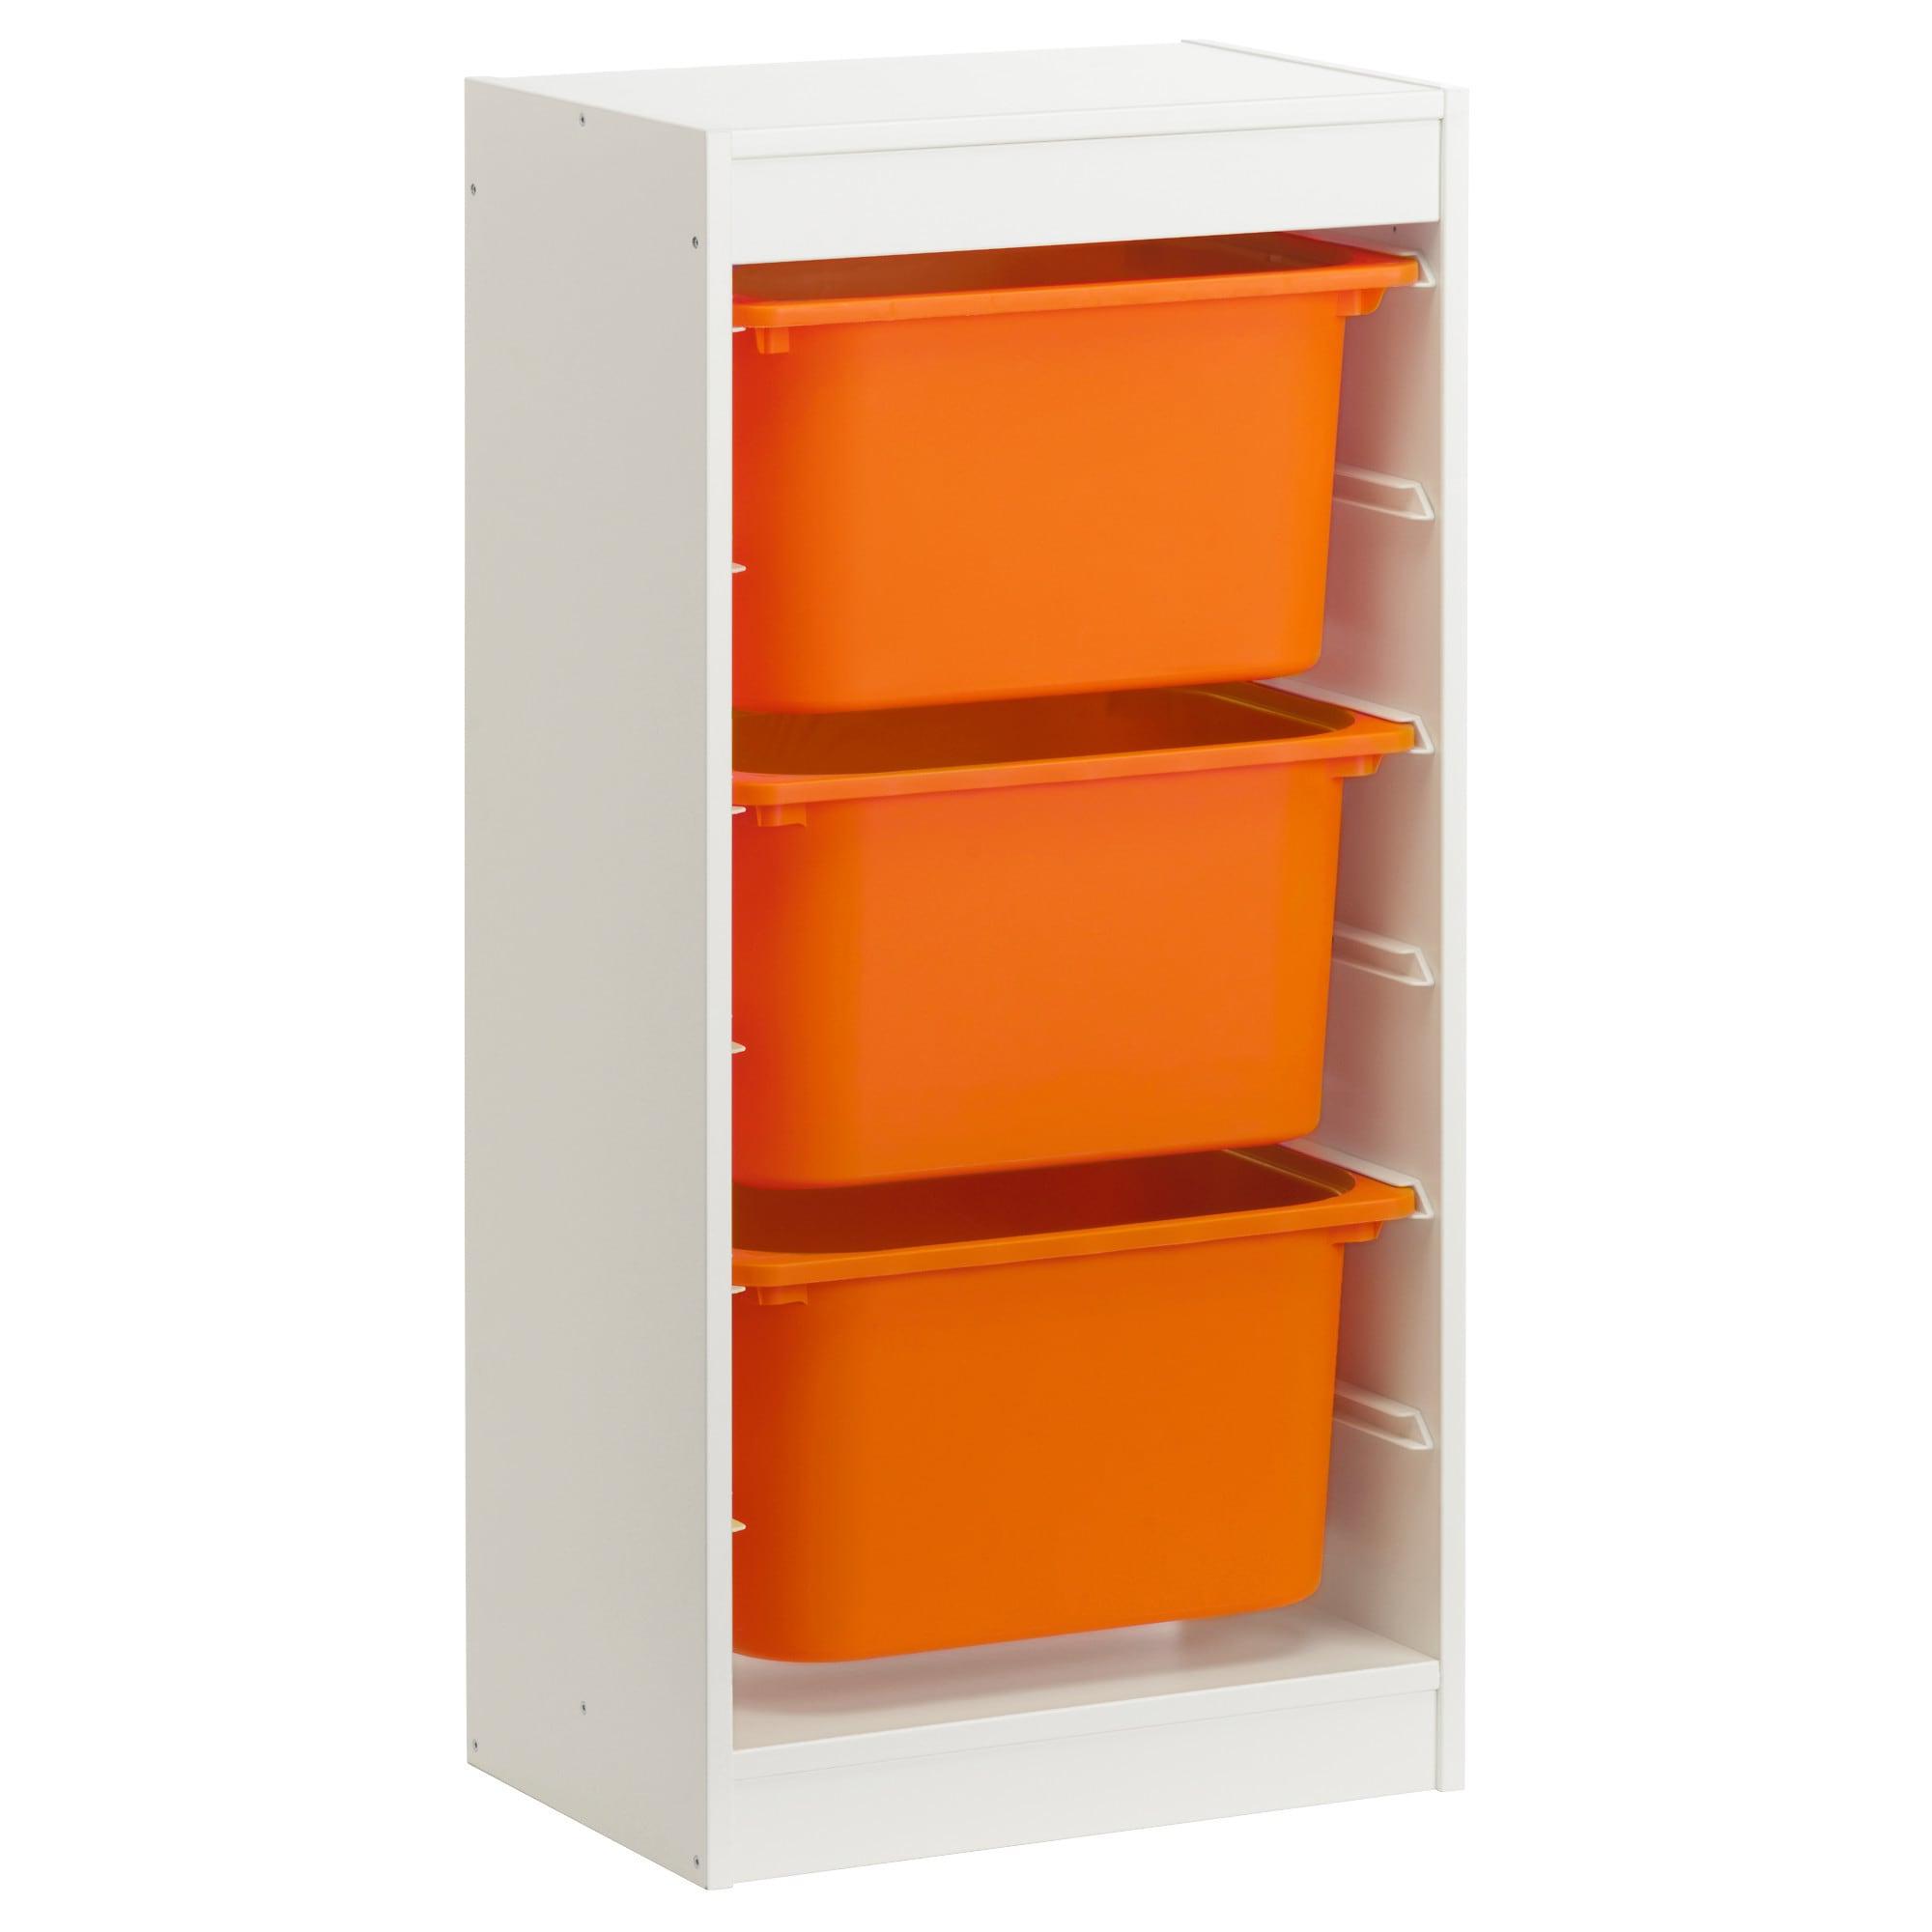 Mueble Almacenaje Juguetes U3dh Almacenaje De Juguetes Guardar Los Juguetes Pra Online Ikea